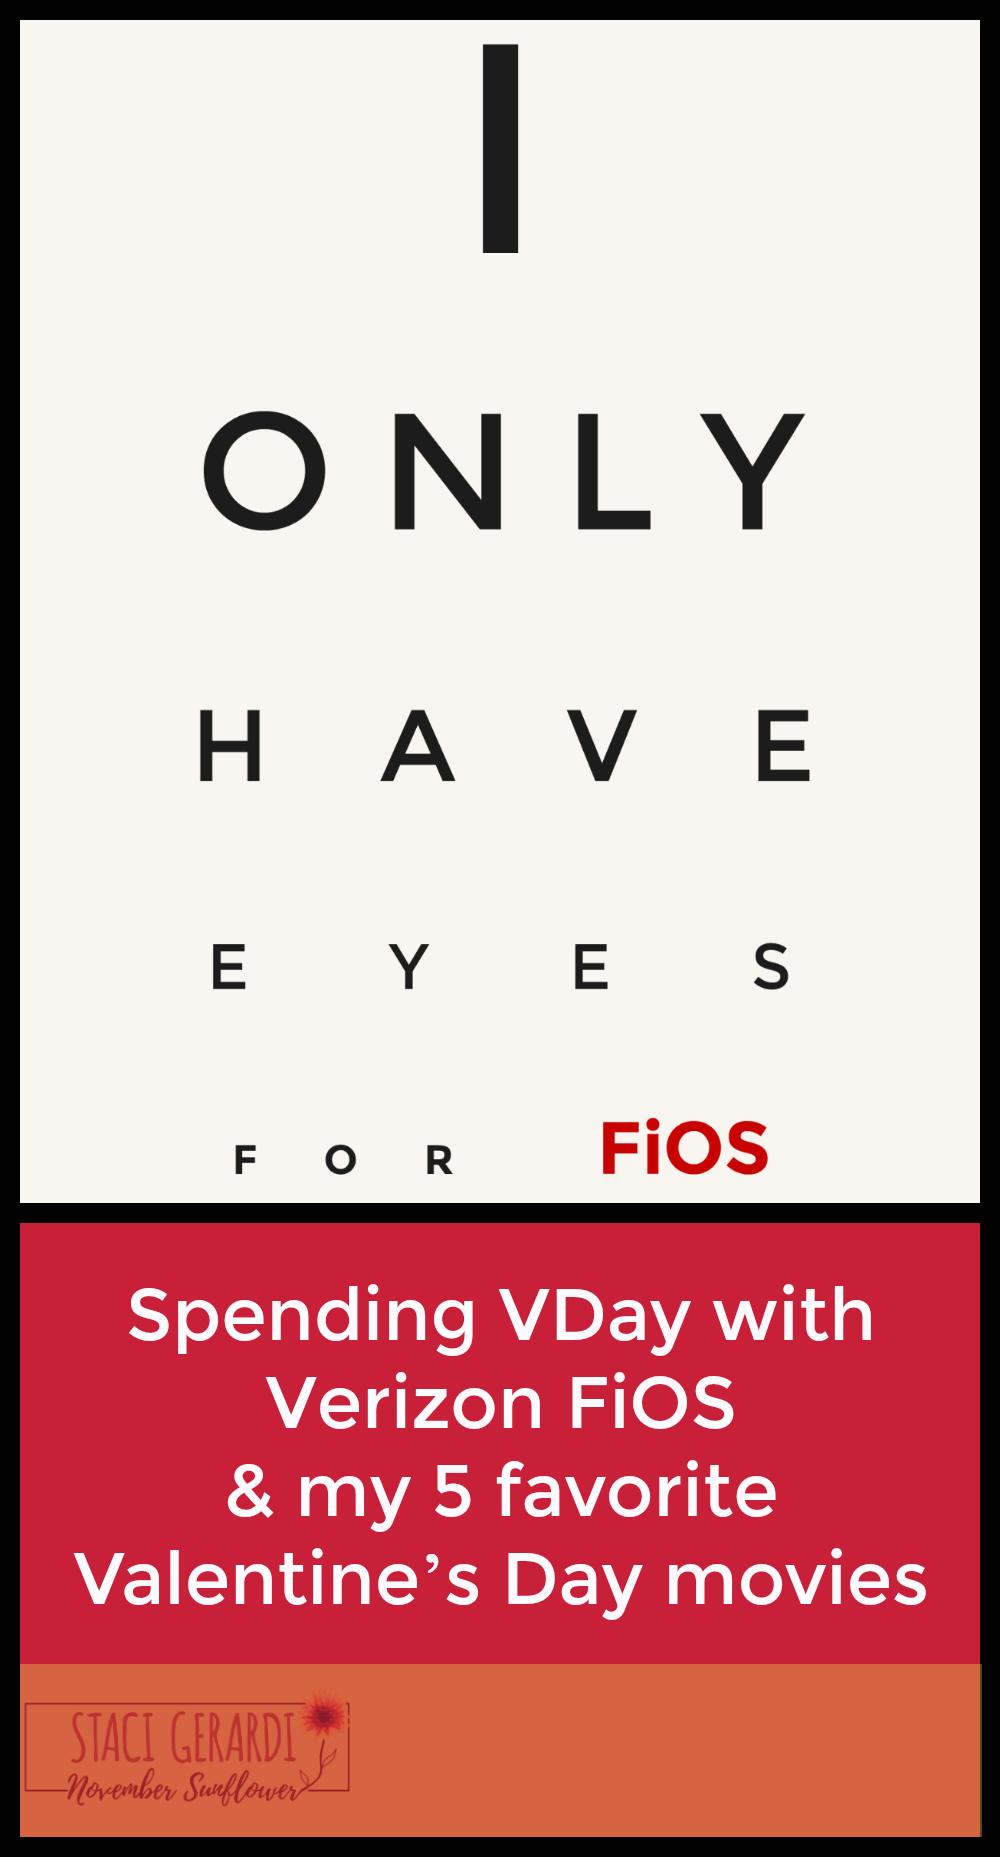 Spending VDay with Verizon FiOS & my 5 favorite Valentine's Day movies